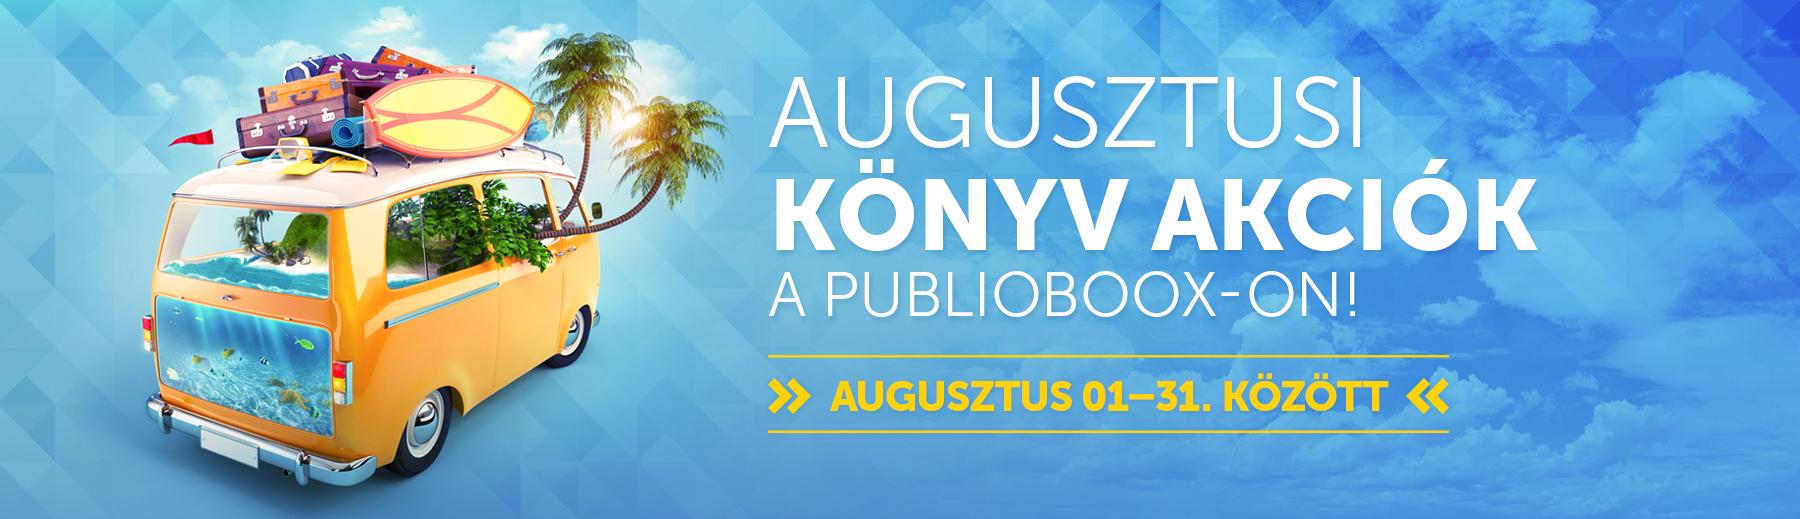 http://admin.konyvaruhaz.info/media/files/1800x51951.jpg